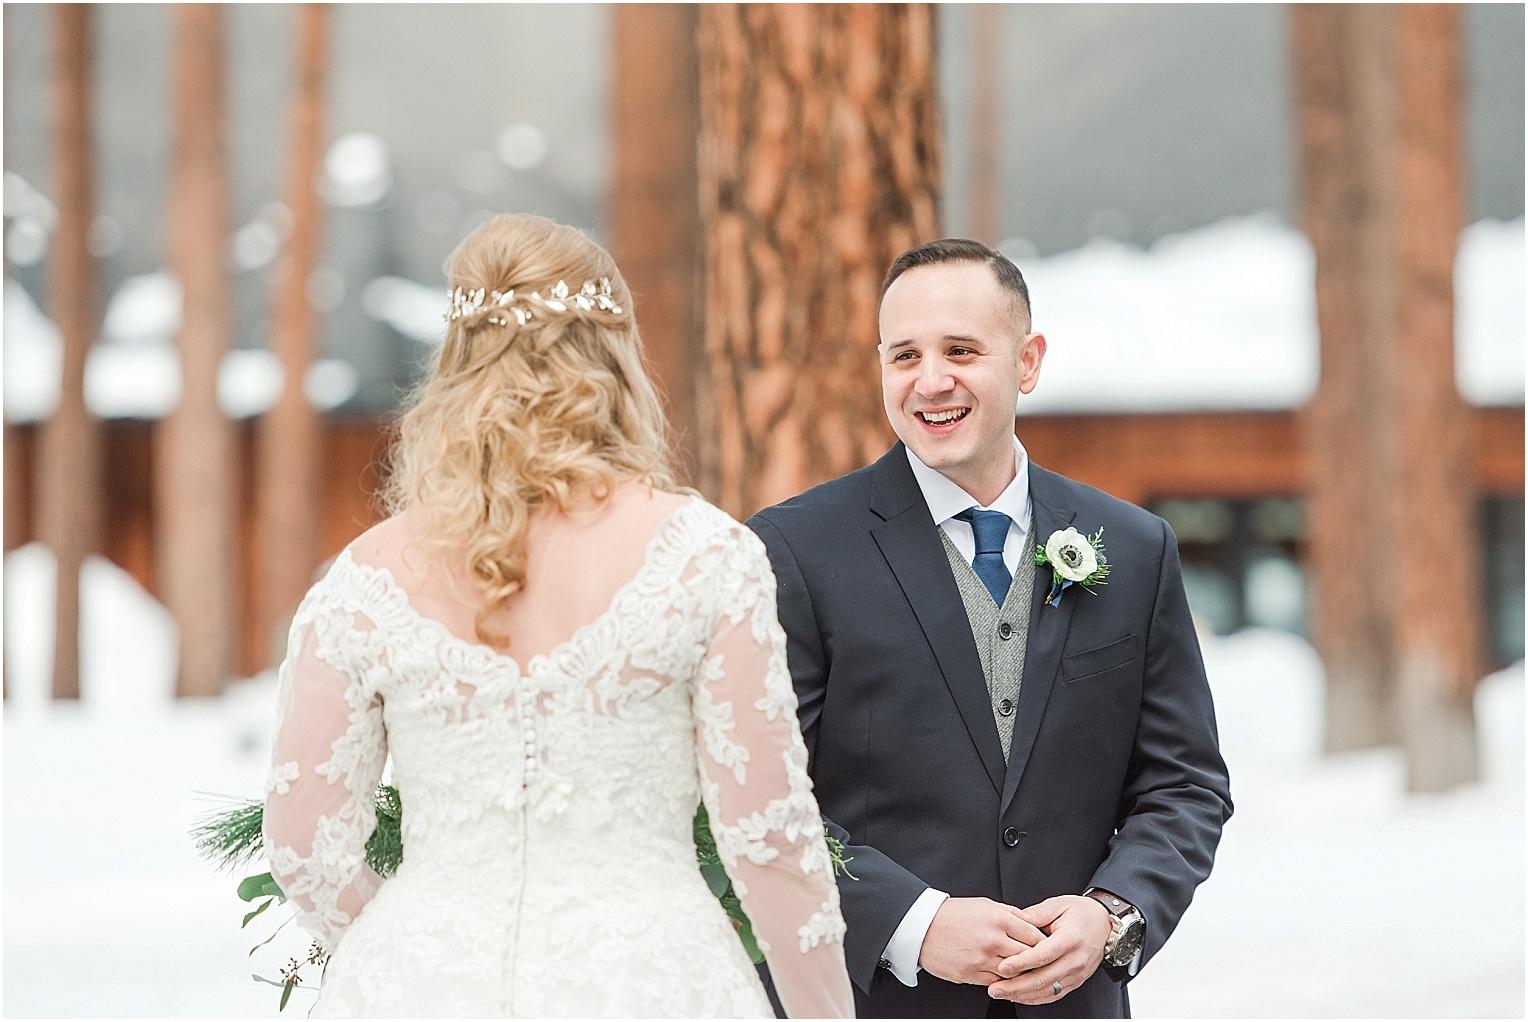 509 Bride_Misty C Photography_3